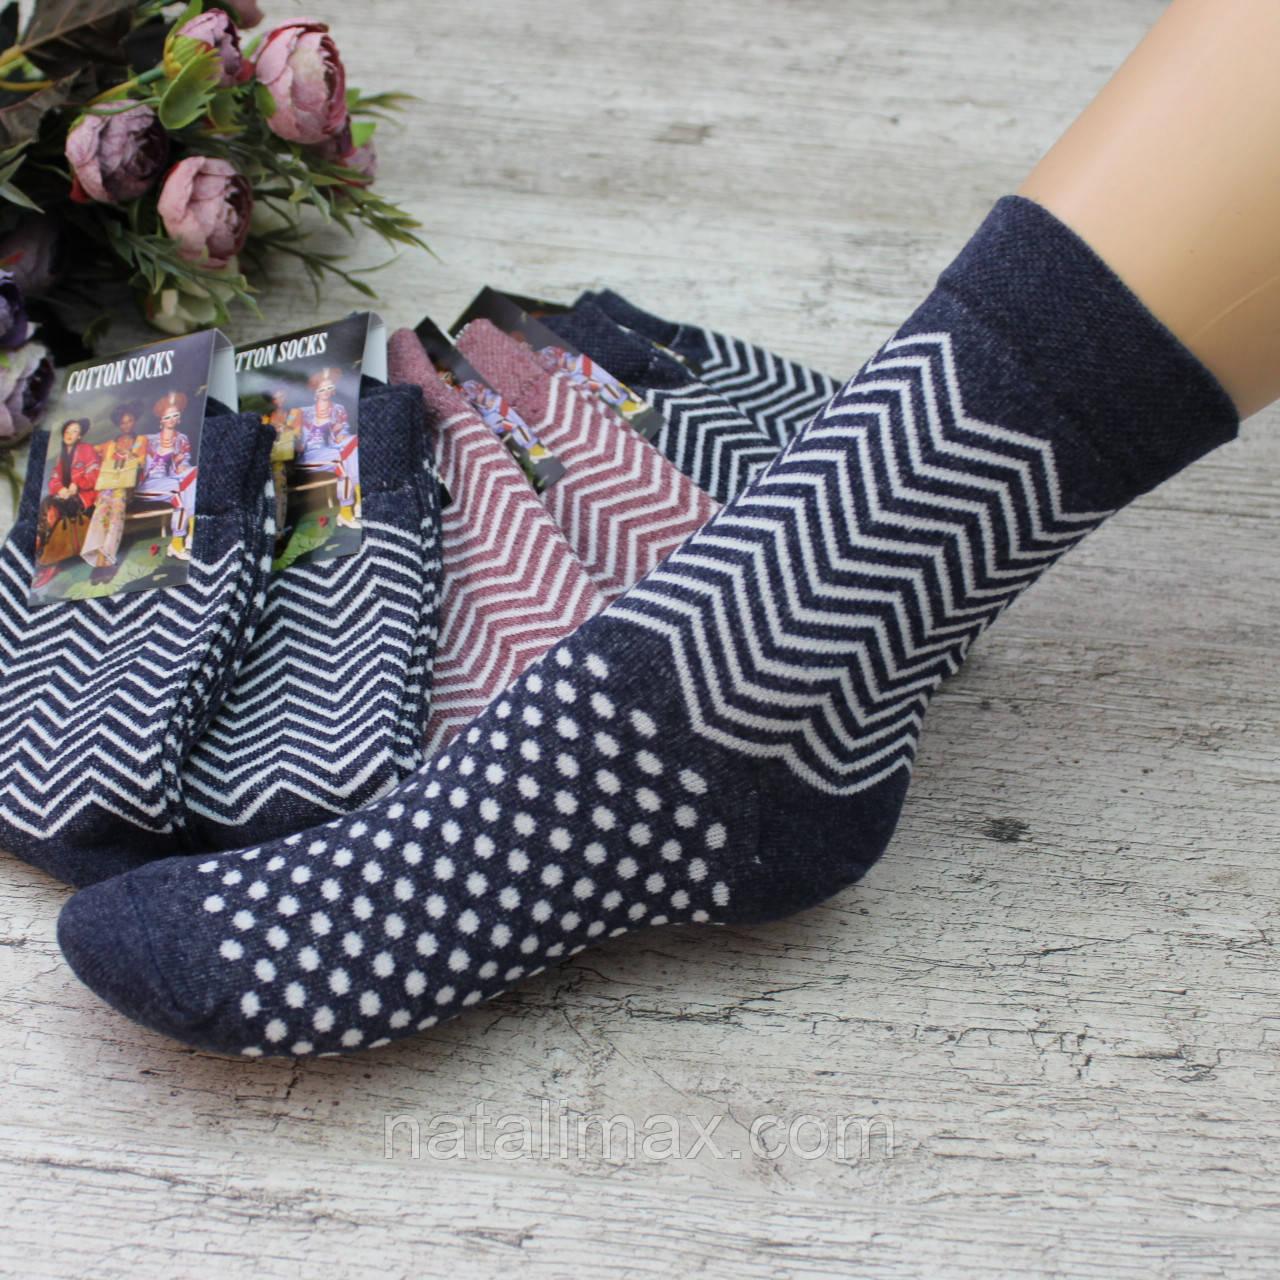 Носочки женские,  размер 36-40. Женские носки, носки для женщин